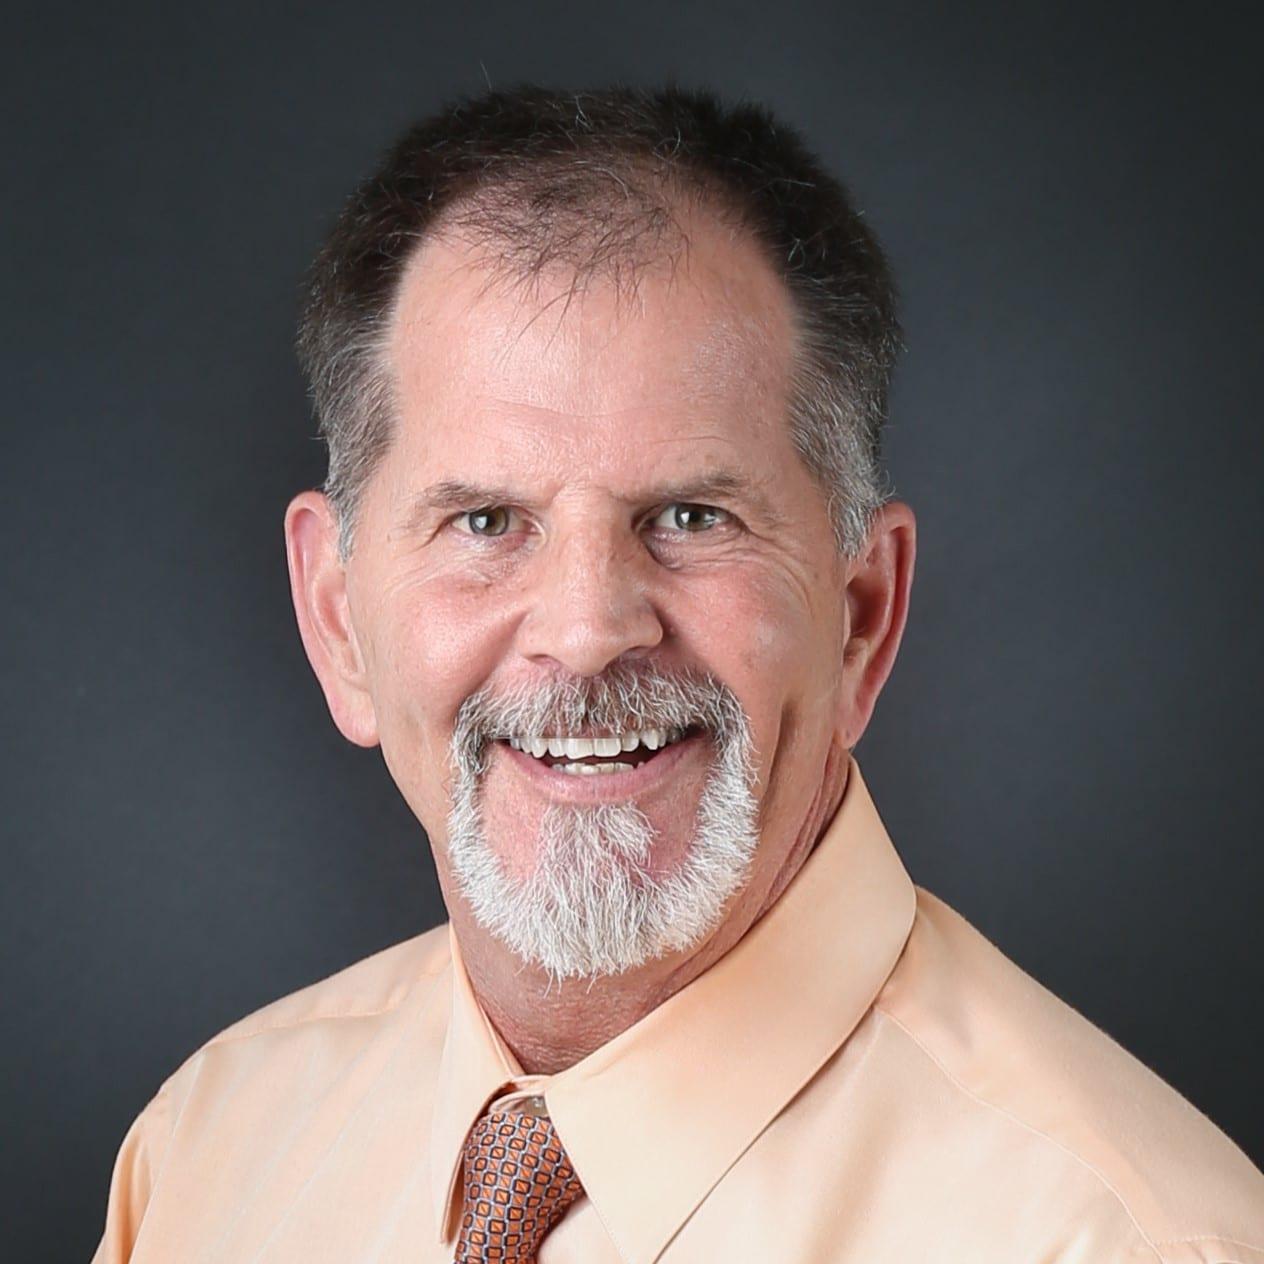 Craig Kopecky MD